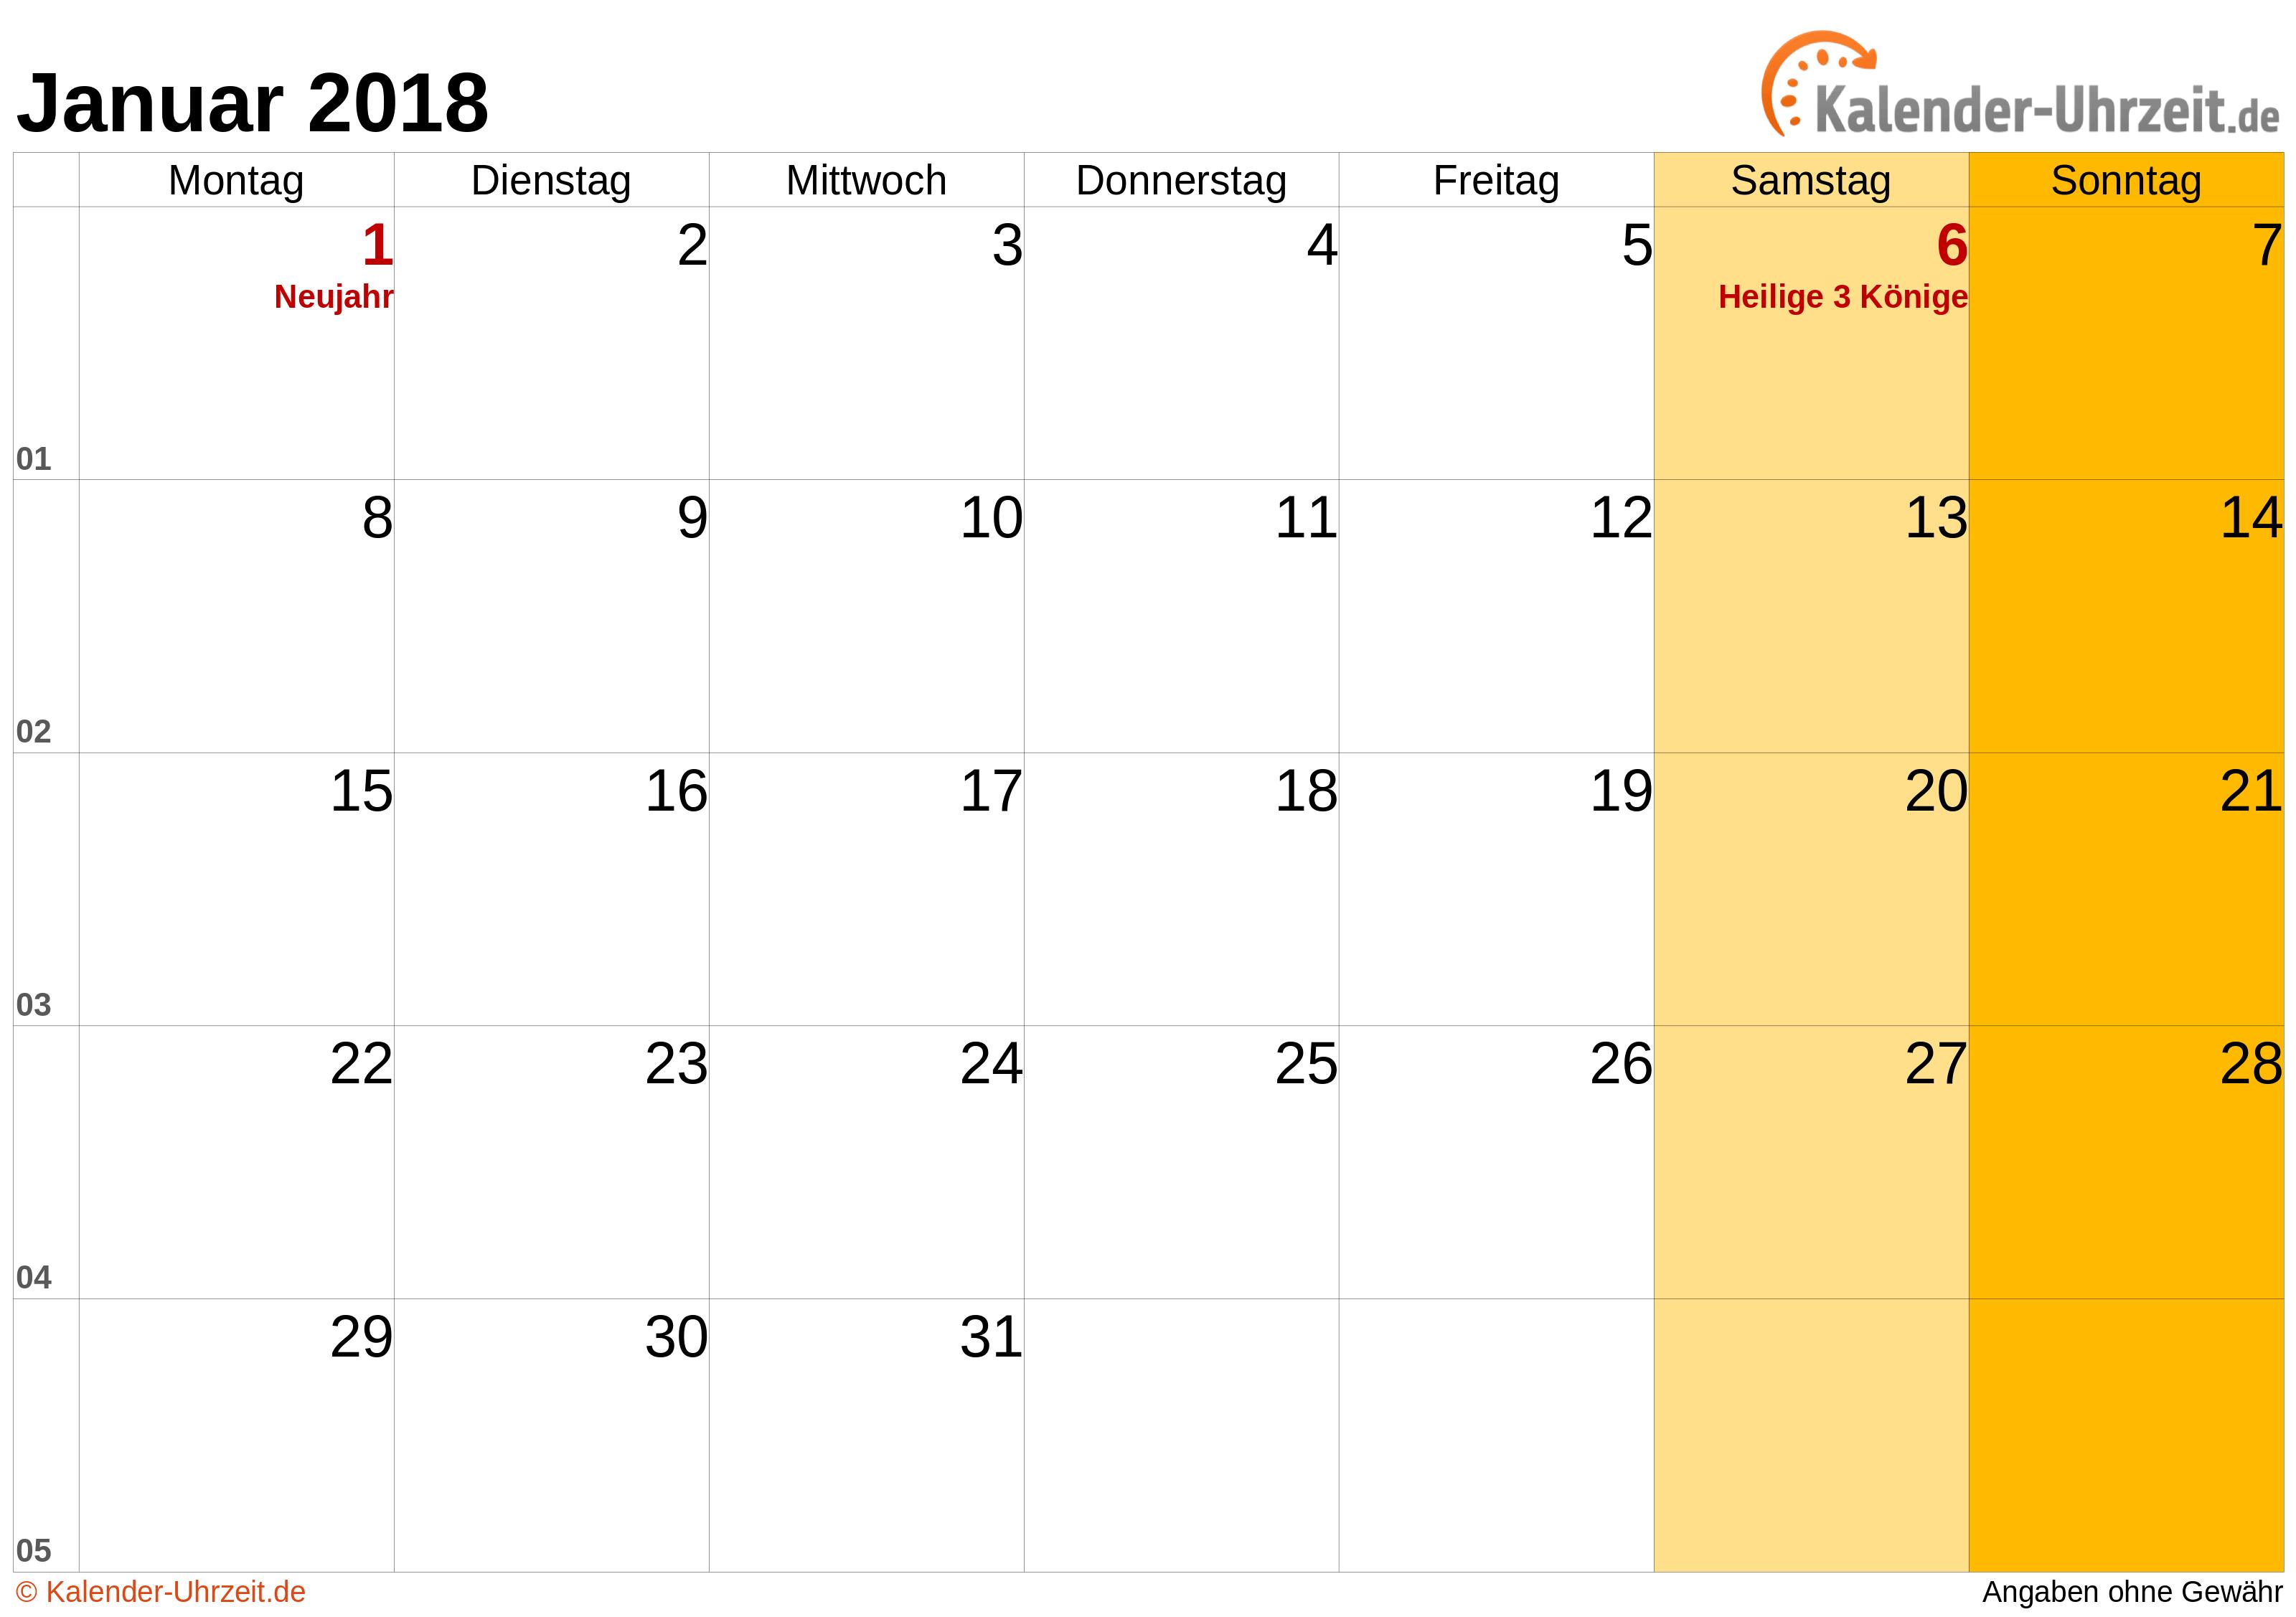 Kalender Januar 2018 zum Ausdrucken